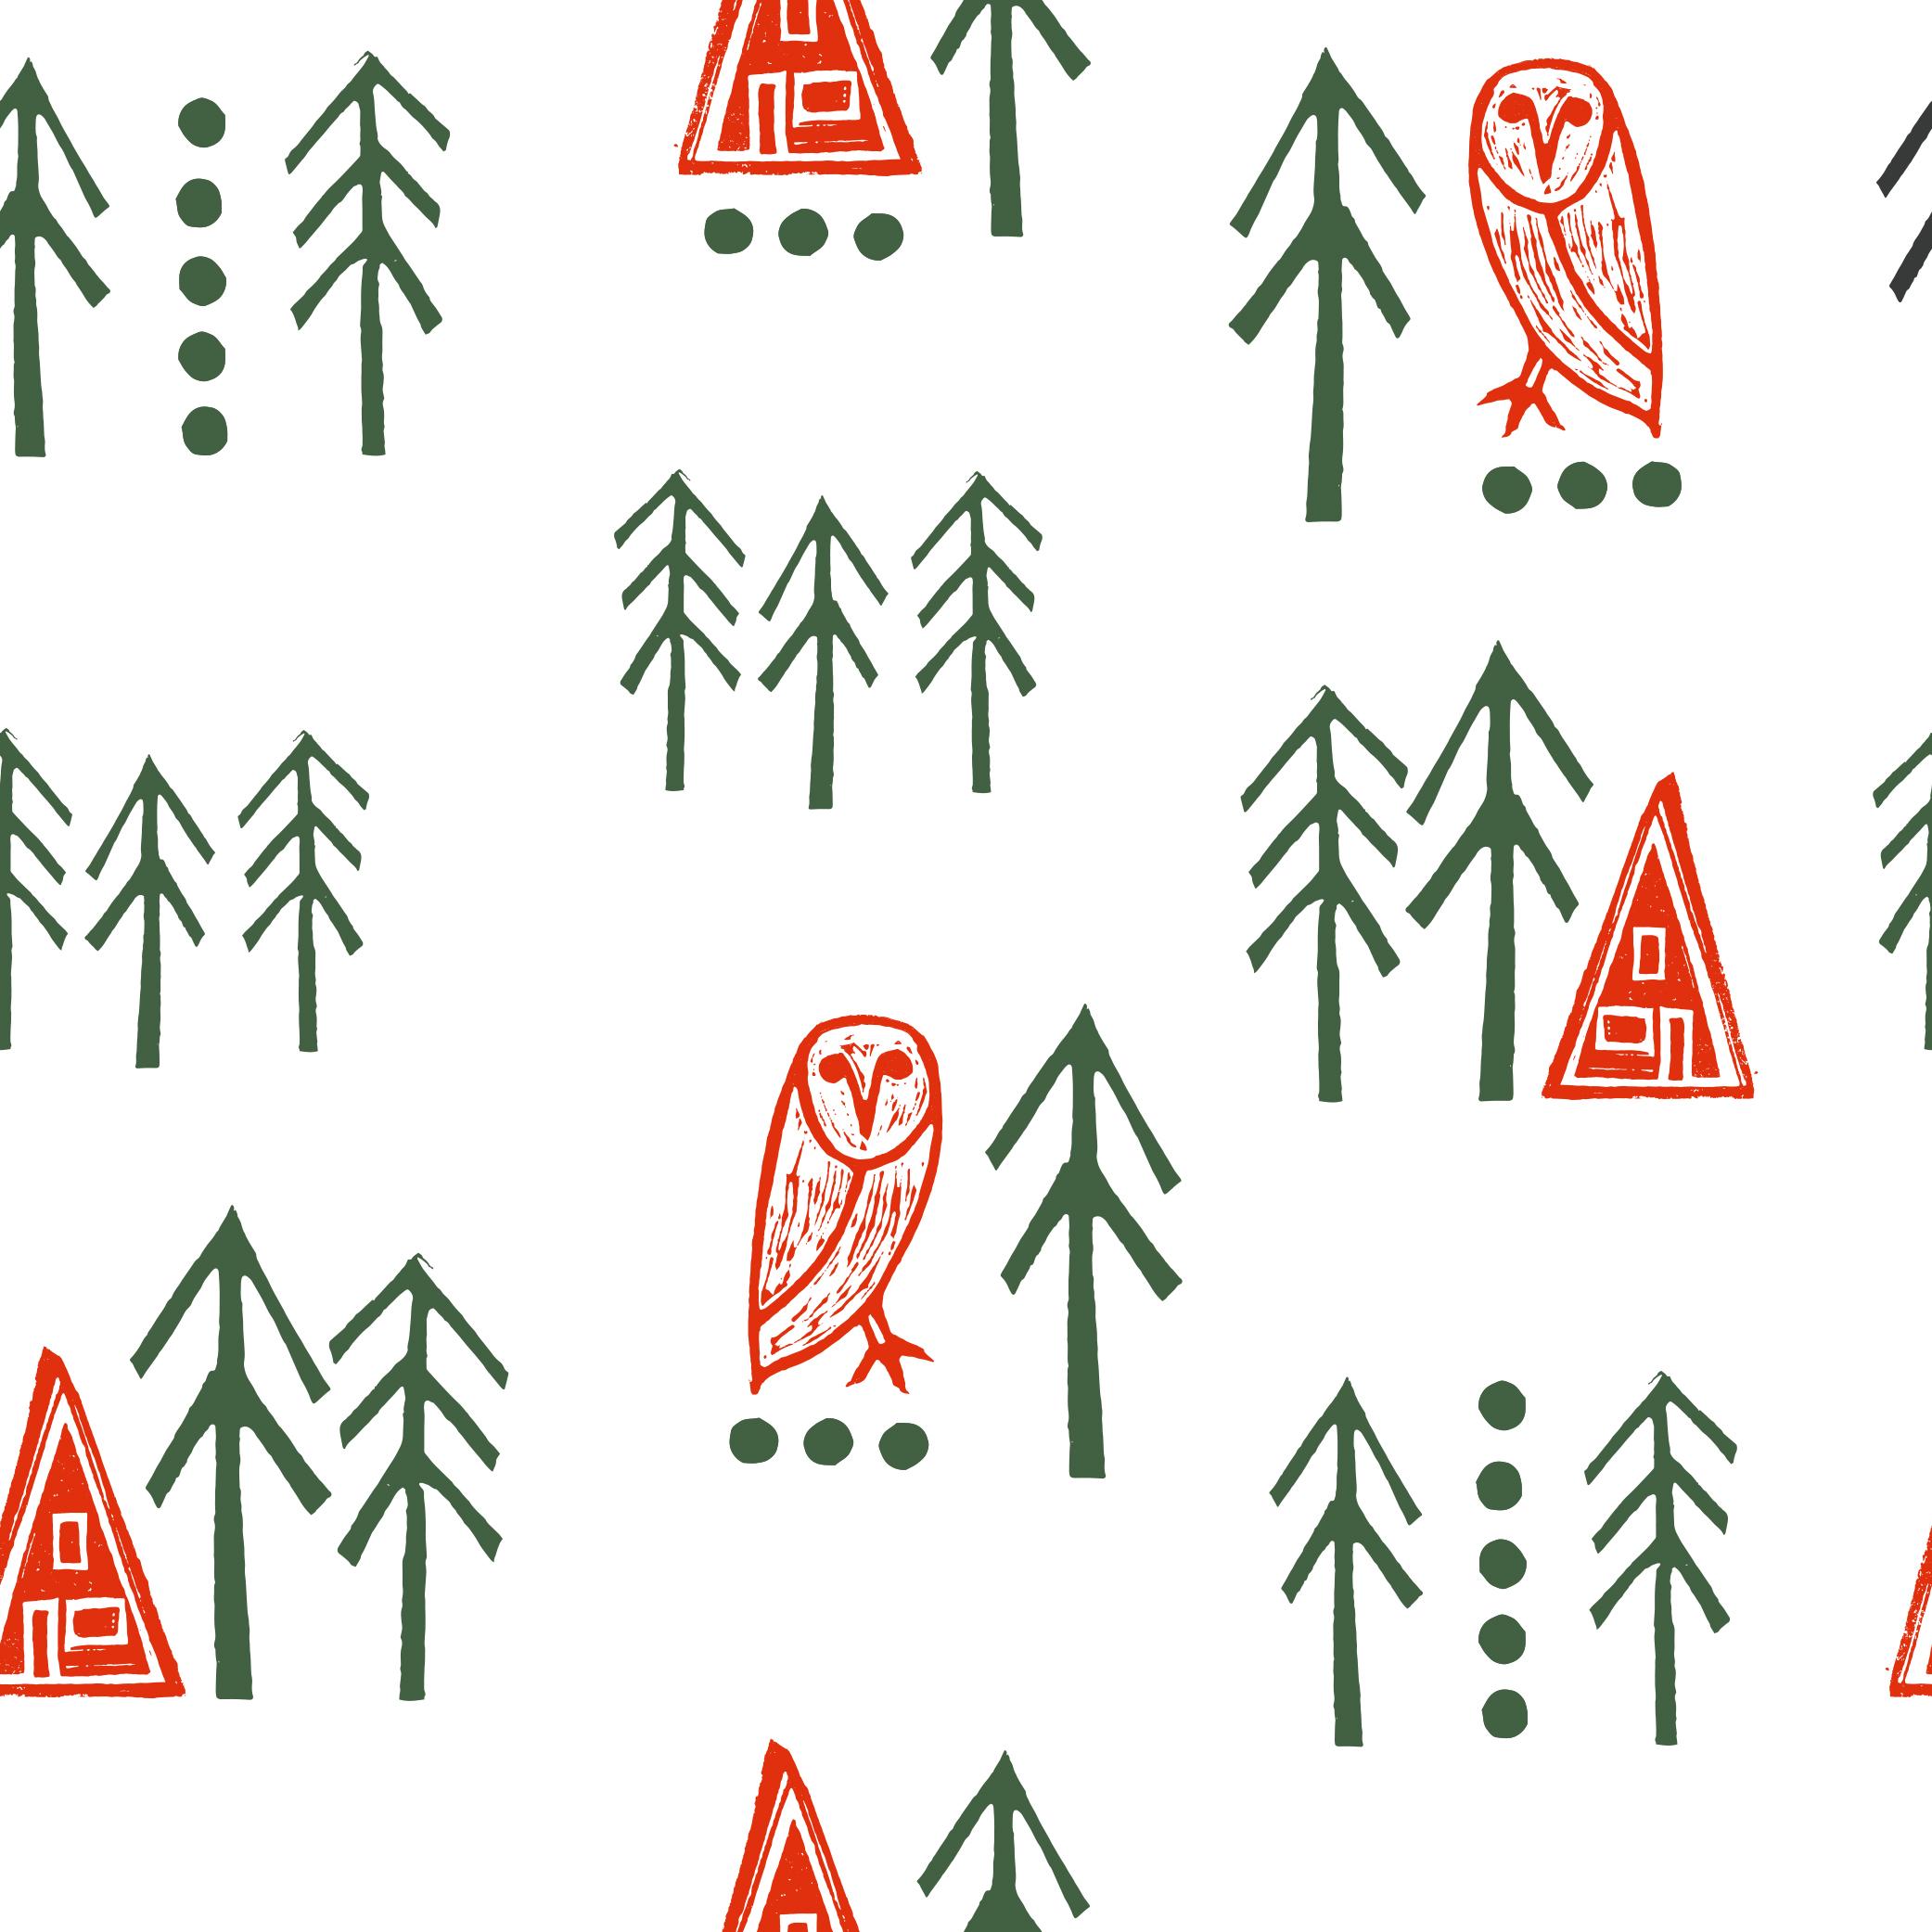 Cabin Life pattern_red_grn_150.jpg